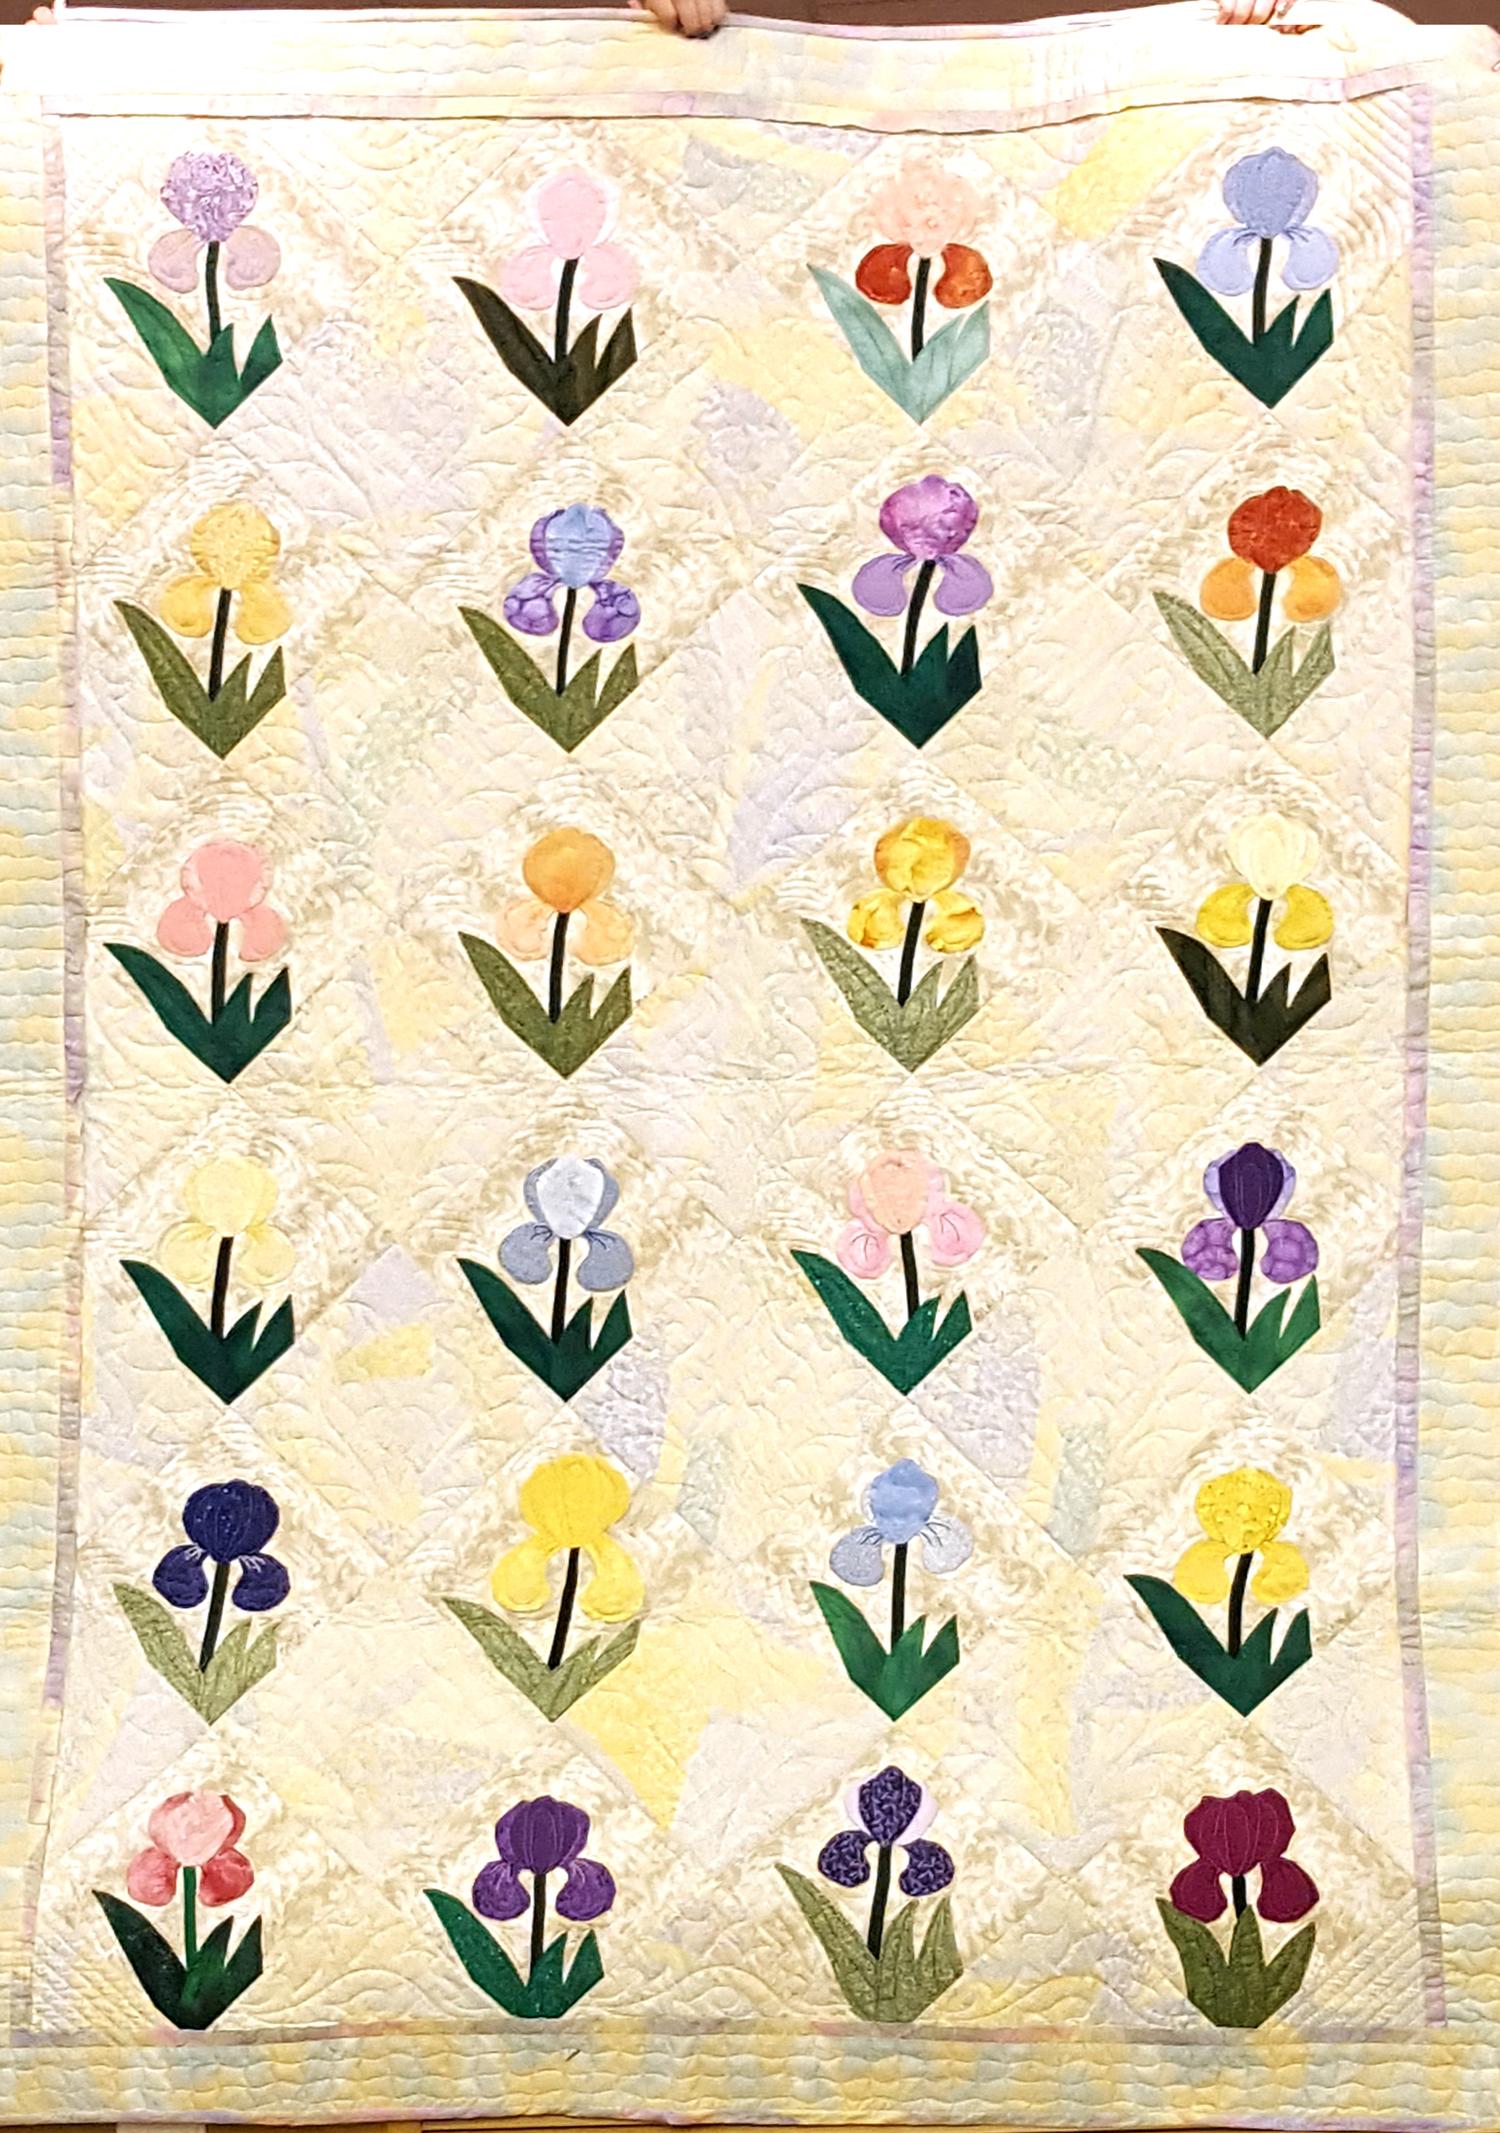 Iris quilt.jpg